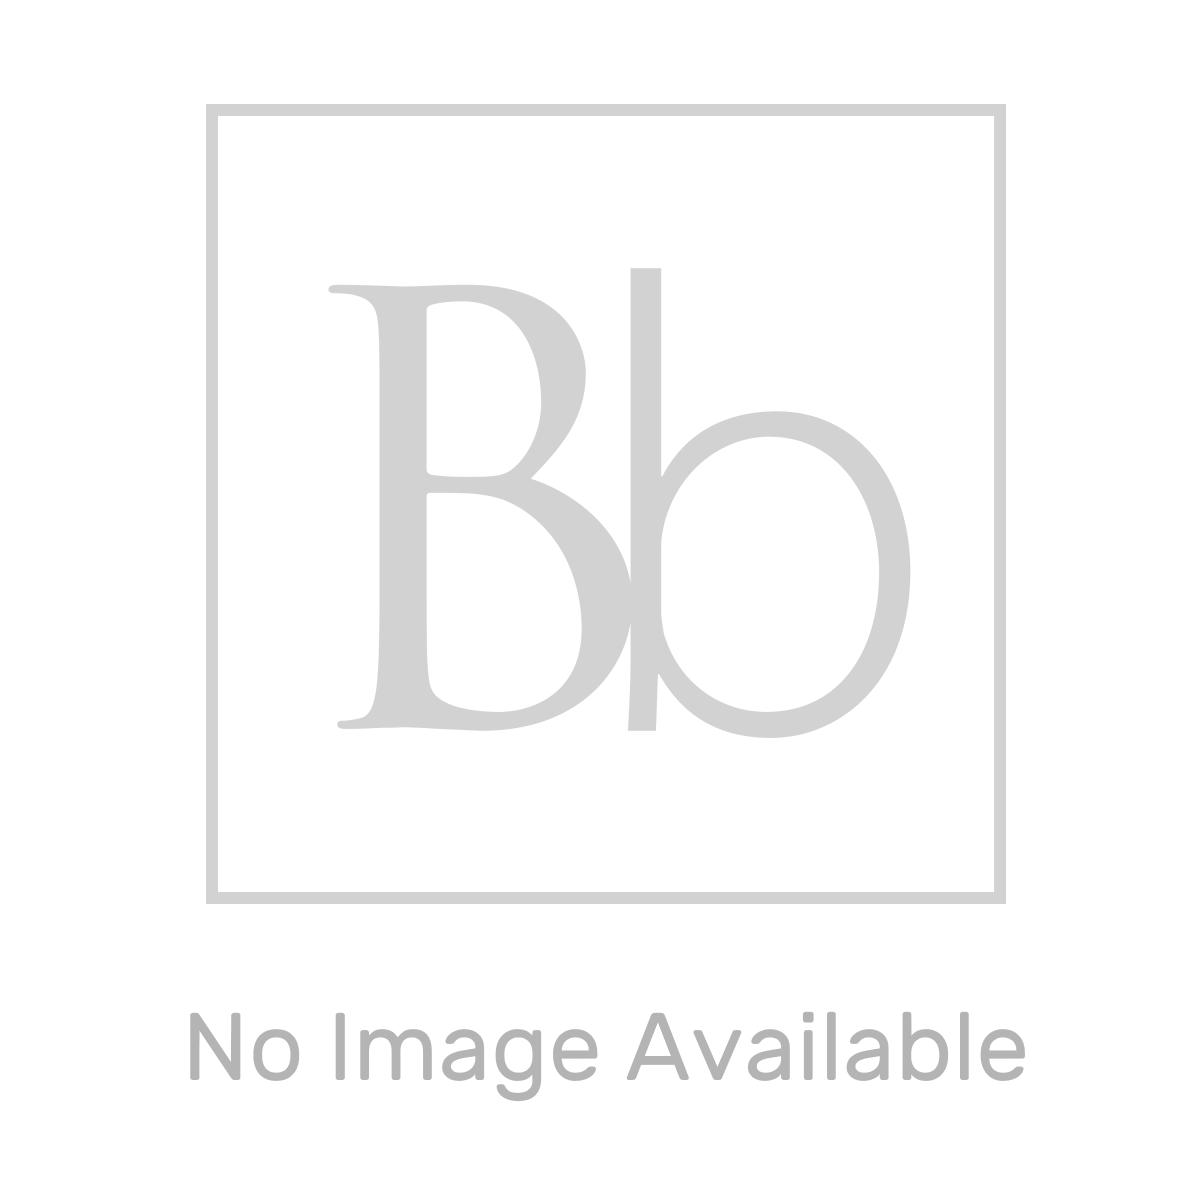 Croydex High Performance 2100 White Textile Shower Curtain